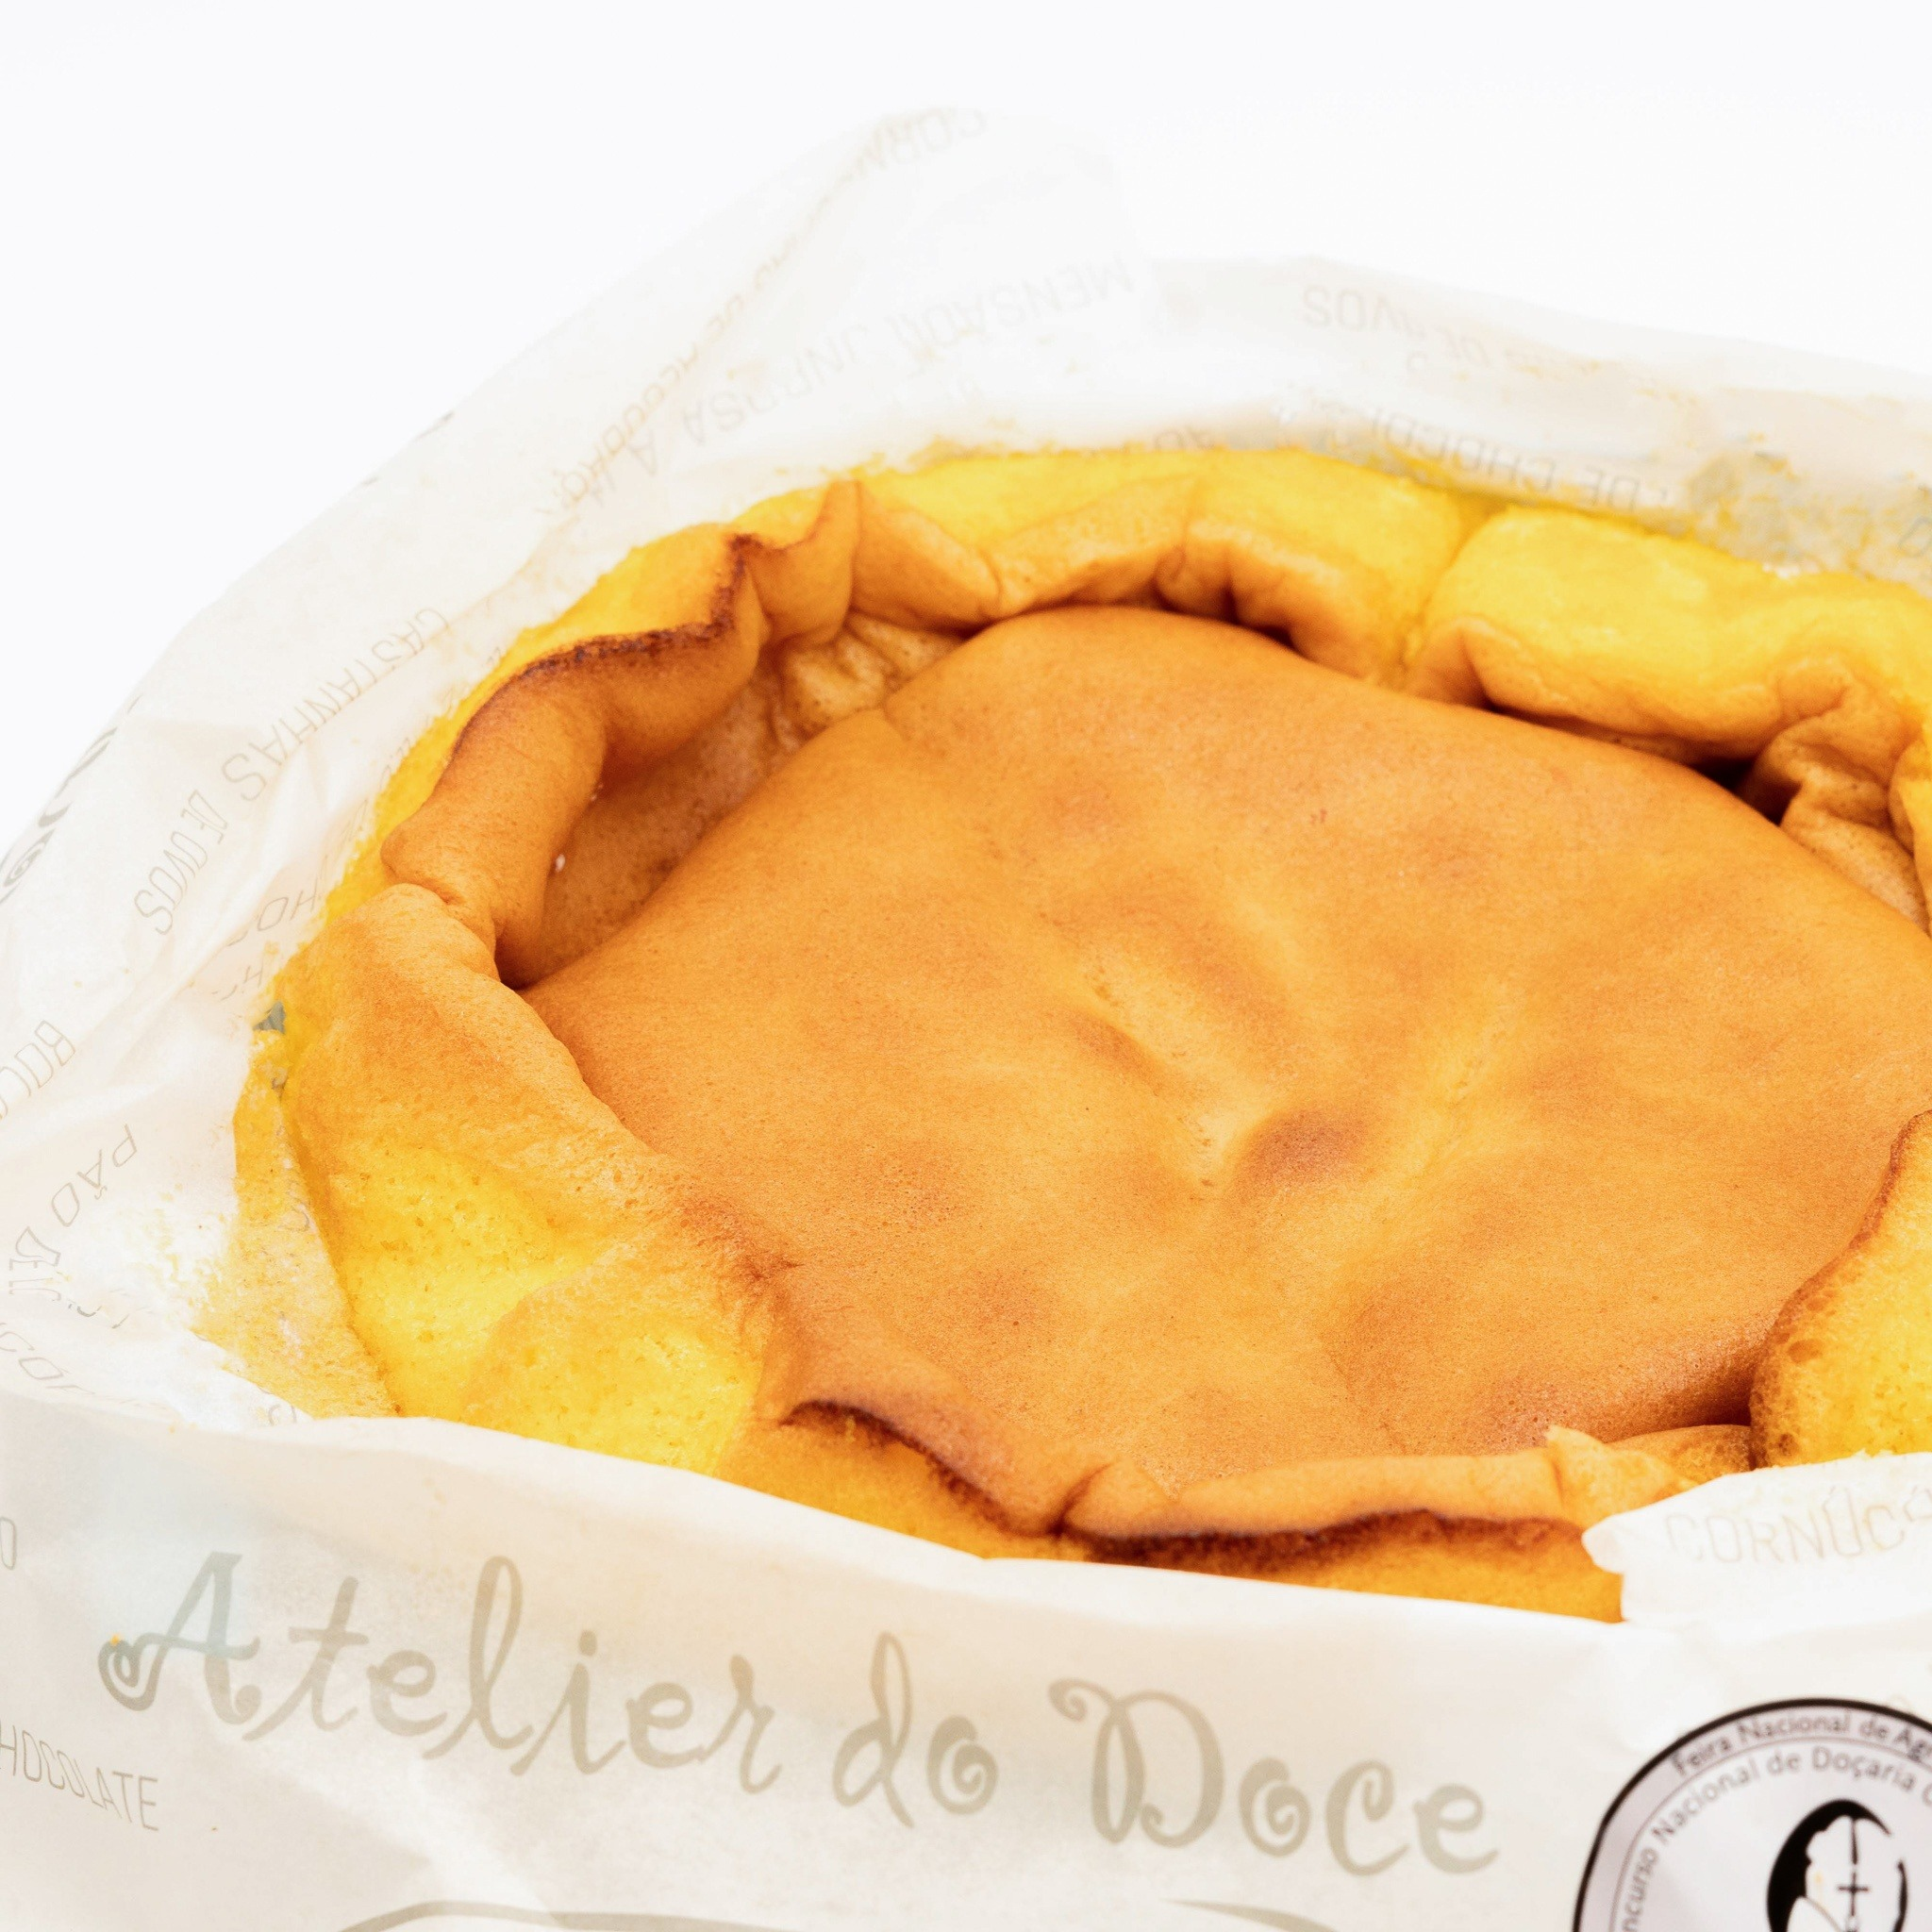 1-pao-lo-alfeizerao-atelier-doce-alfeizerao-doces-conventuais